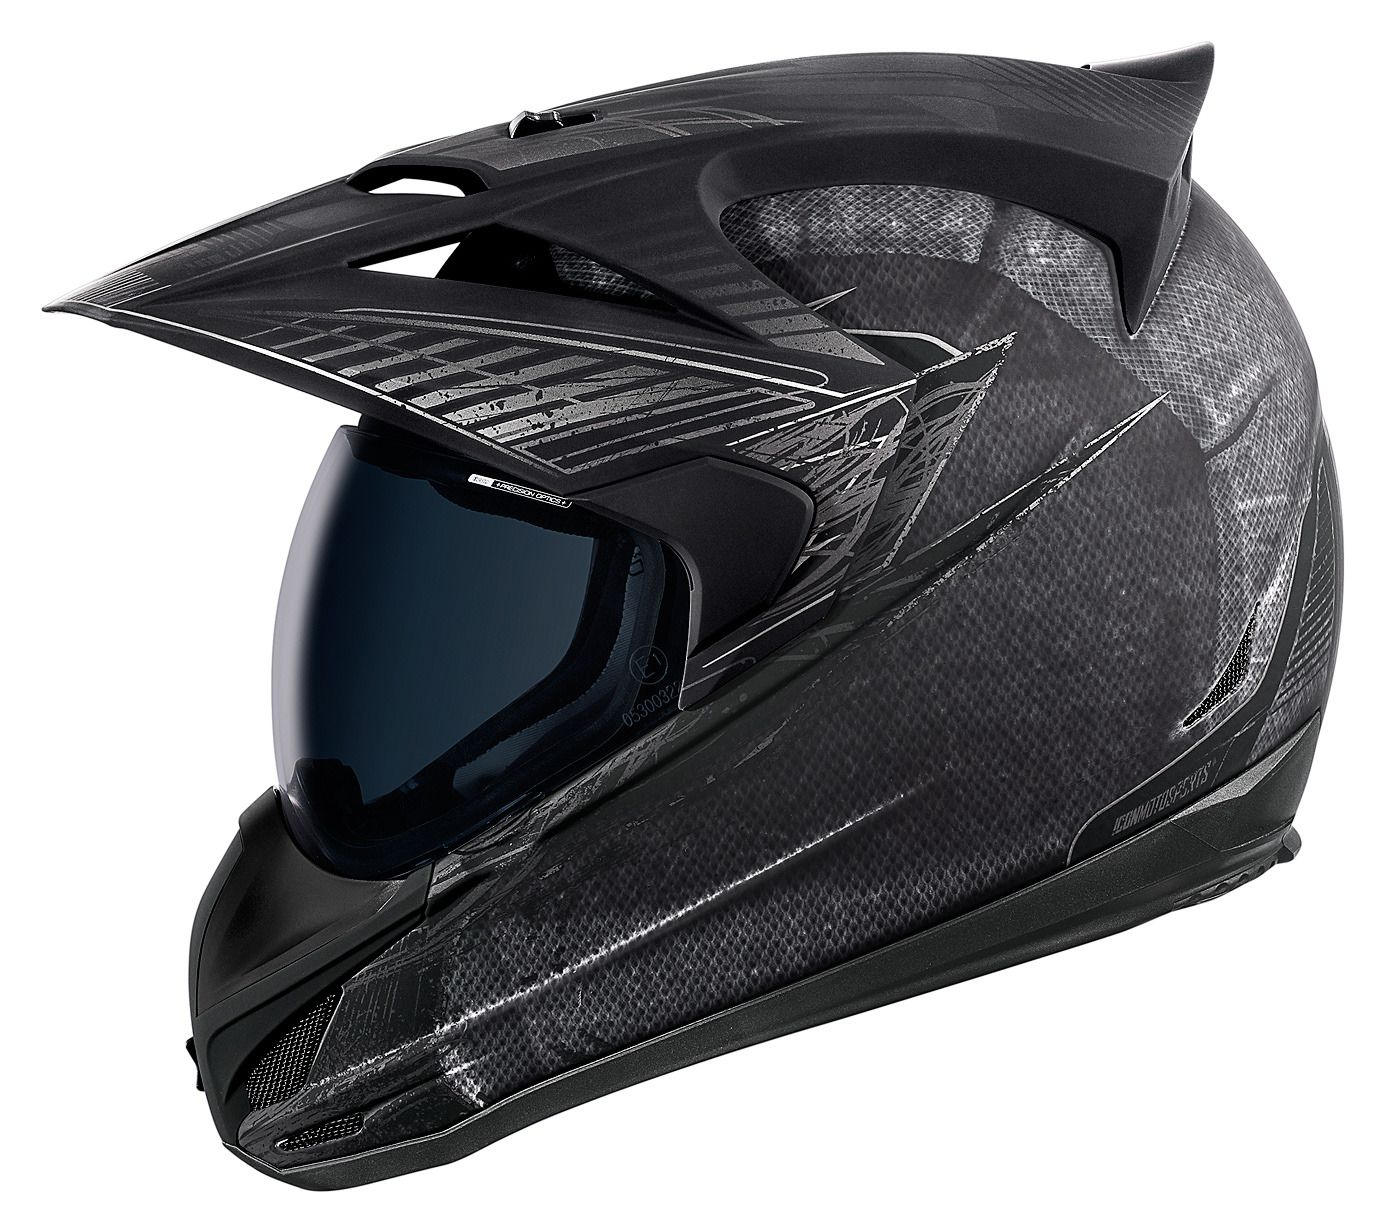 Otro a puntito! - Página 2 Icon_variant_battlescar_helmet_charcoal